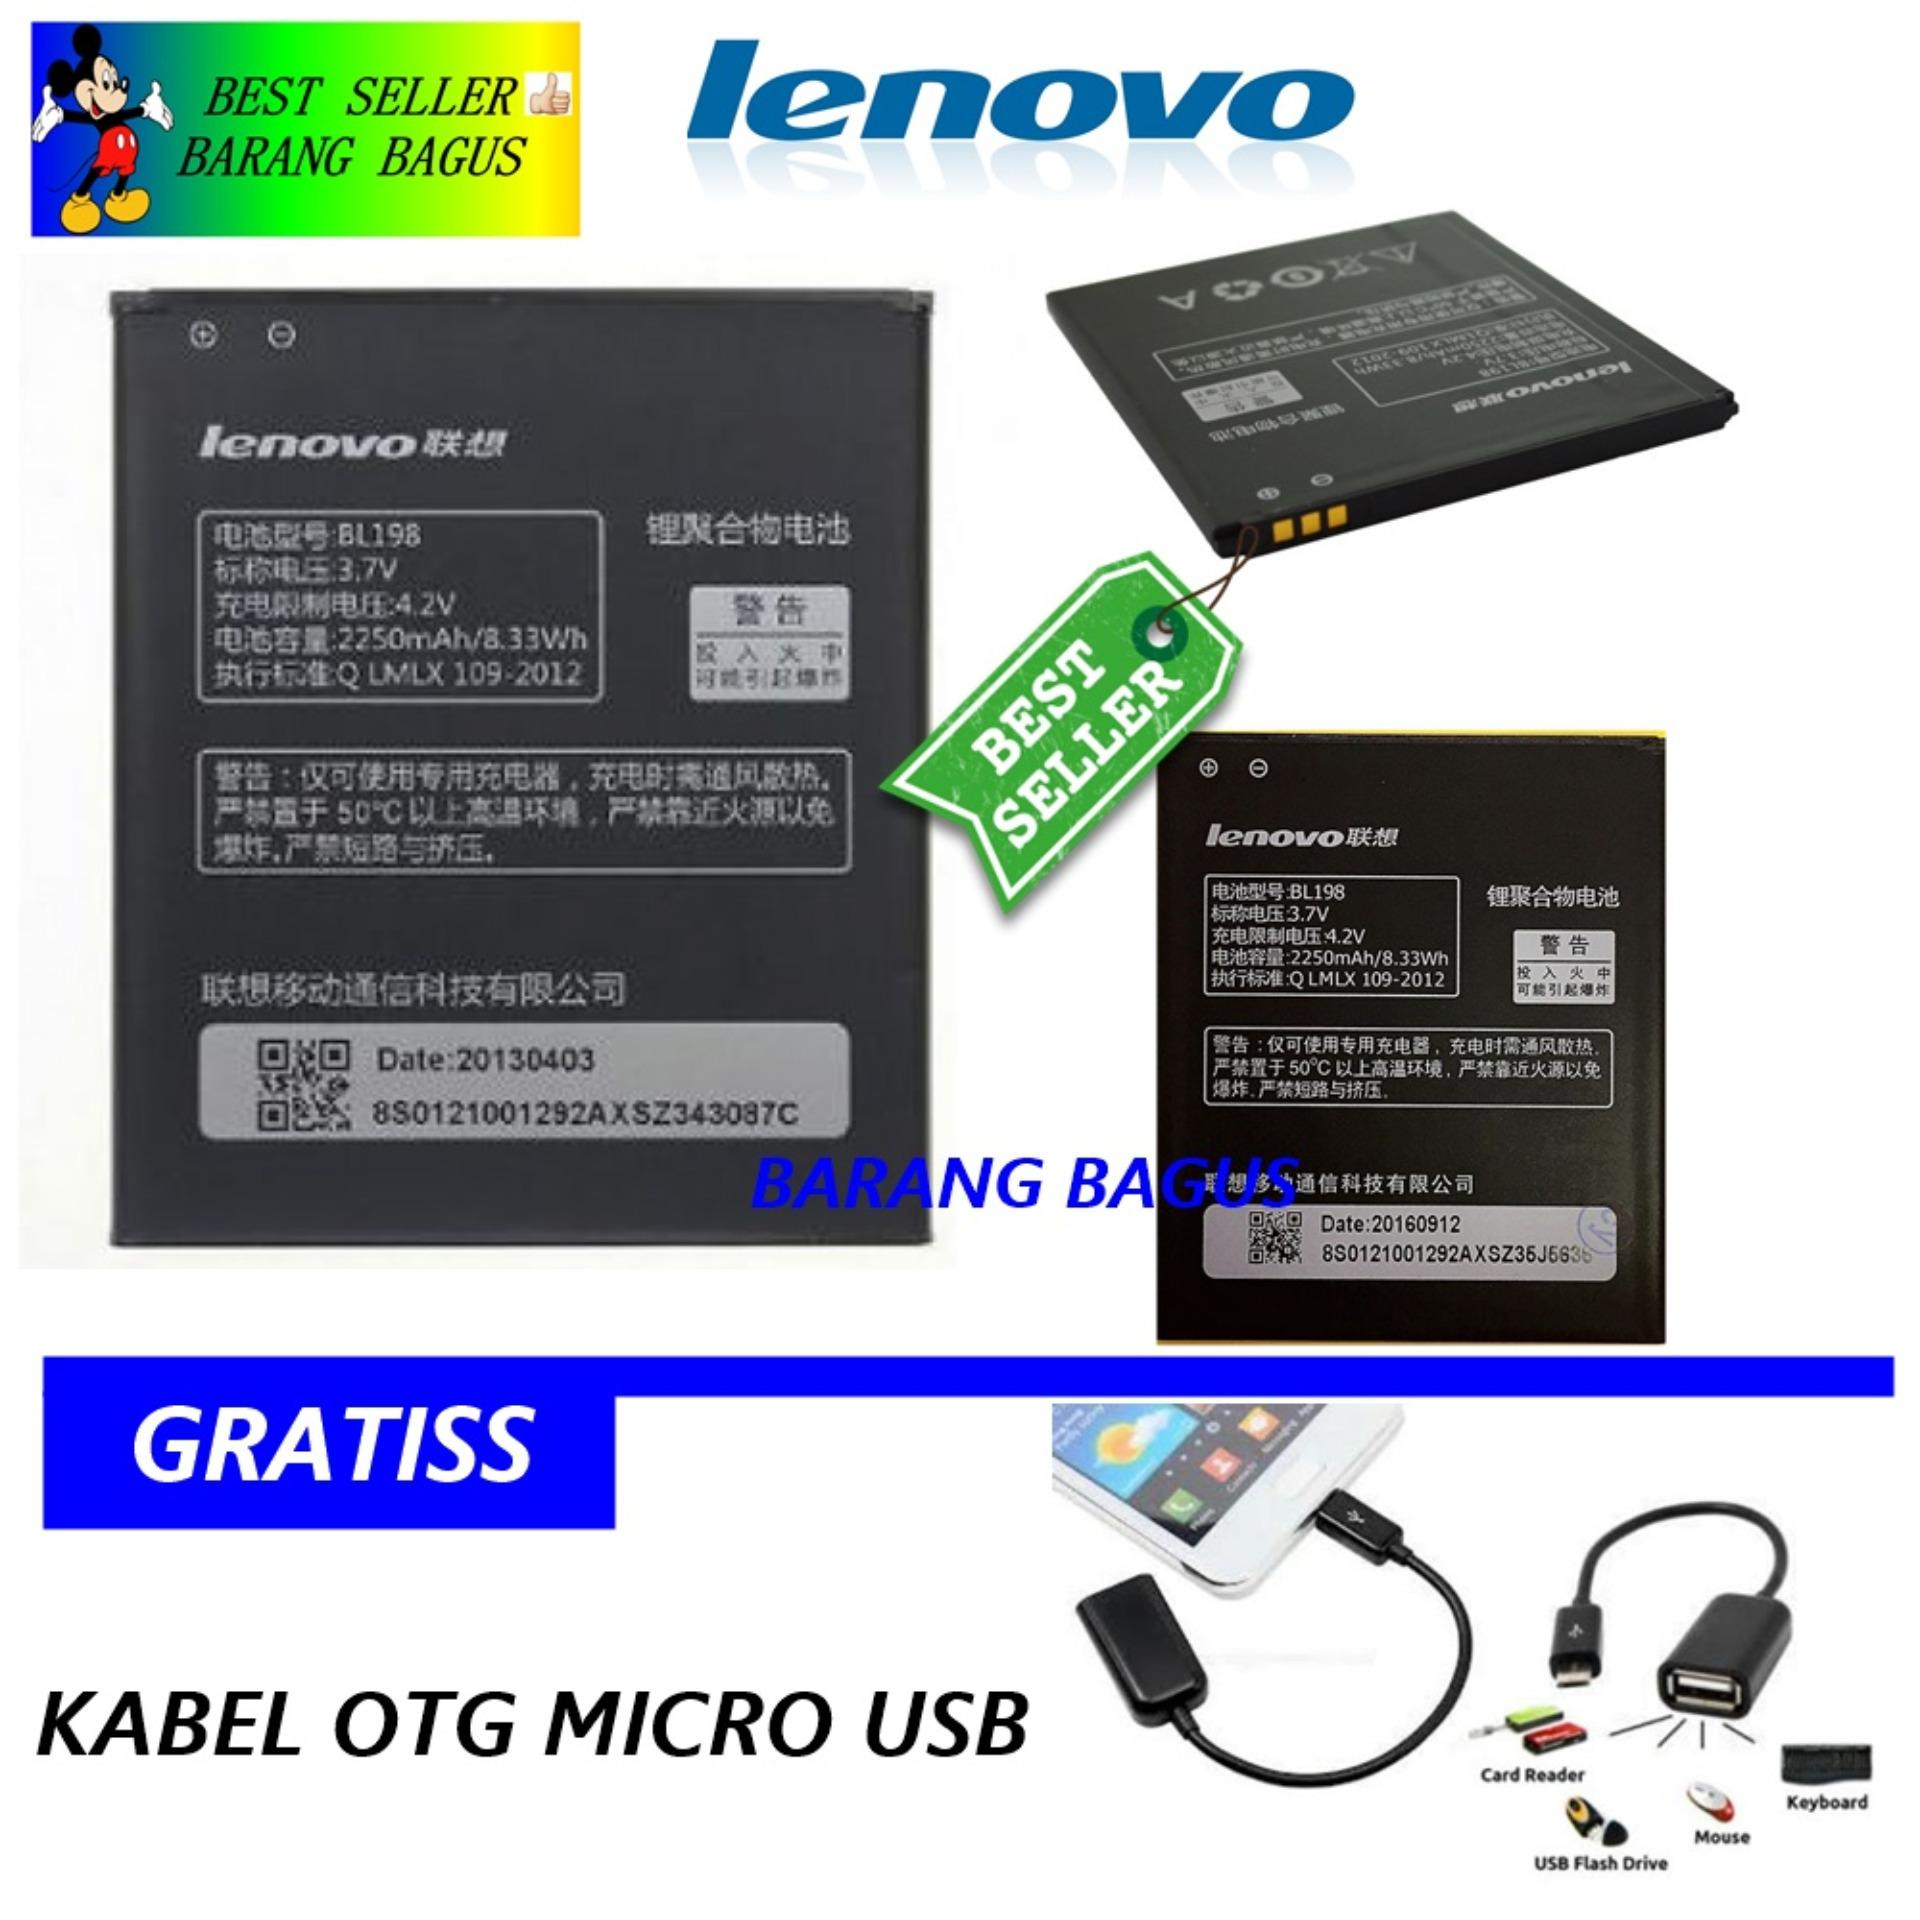 Lenovo Baterai / Battery BL198 Original For Lenovo S880 / S920 / S890 / K860 / A850 / A859 / A800- Kapasitas 2250mAh + Bonus Kabel Otg Micro Usb